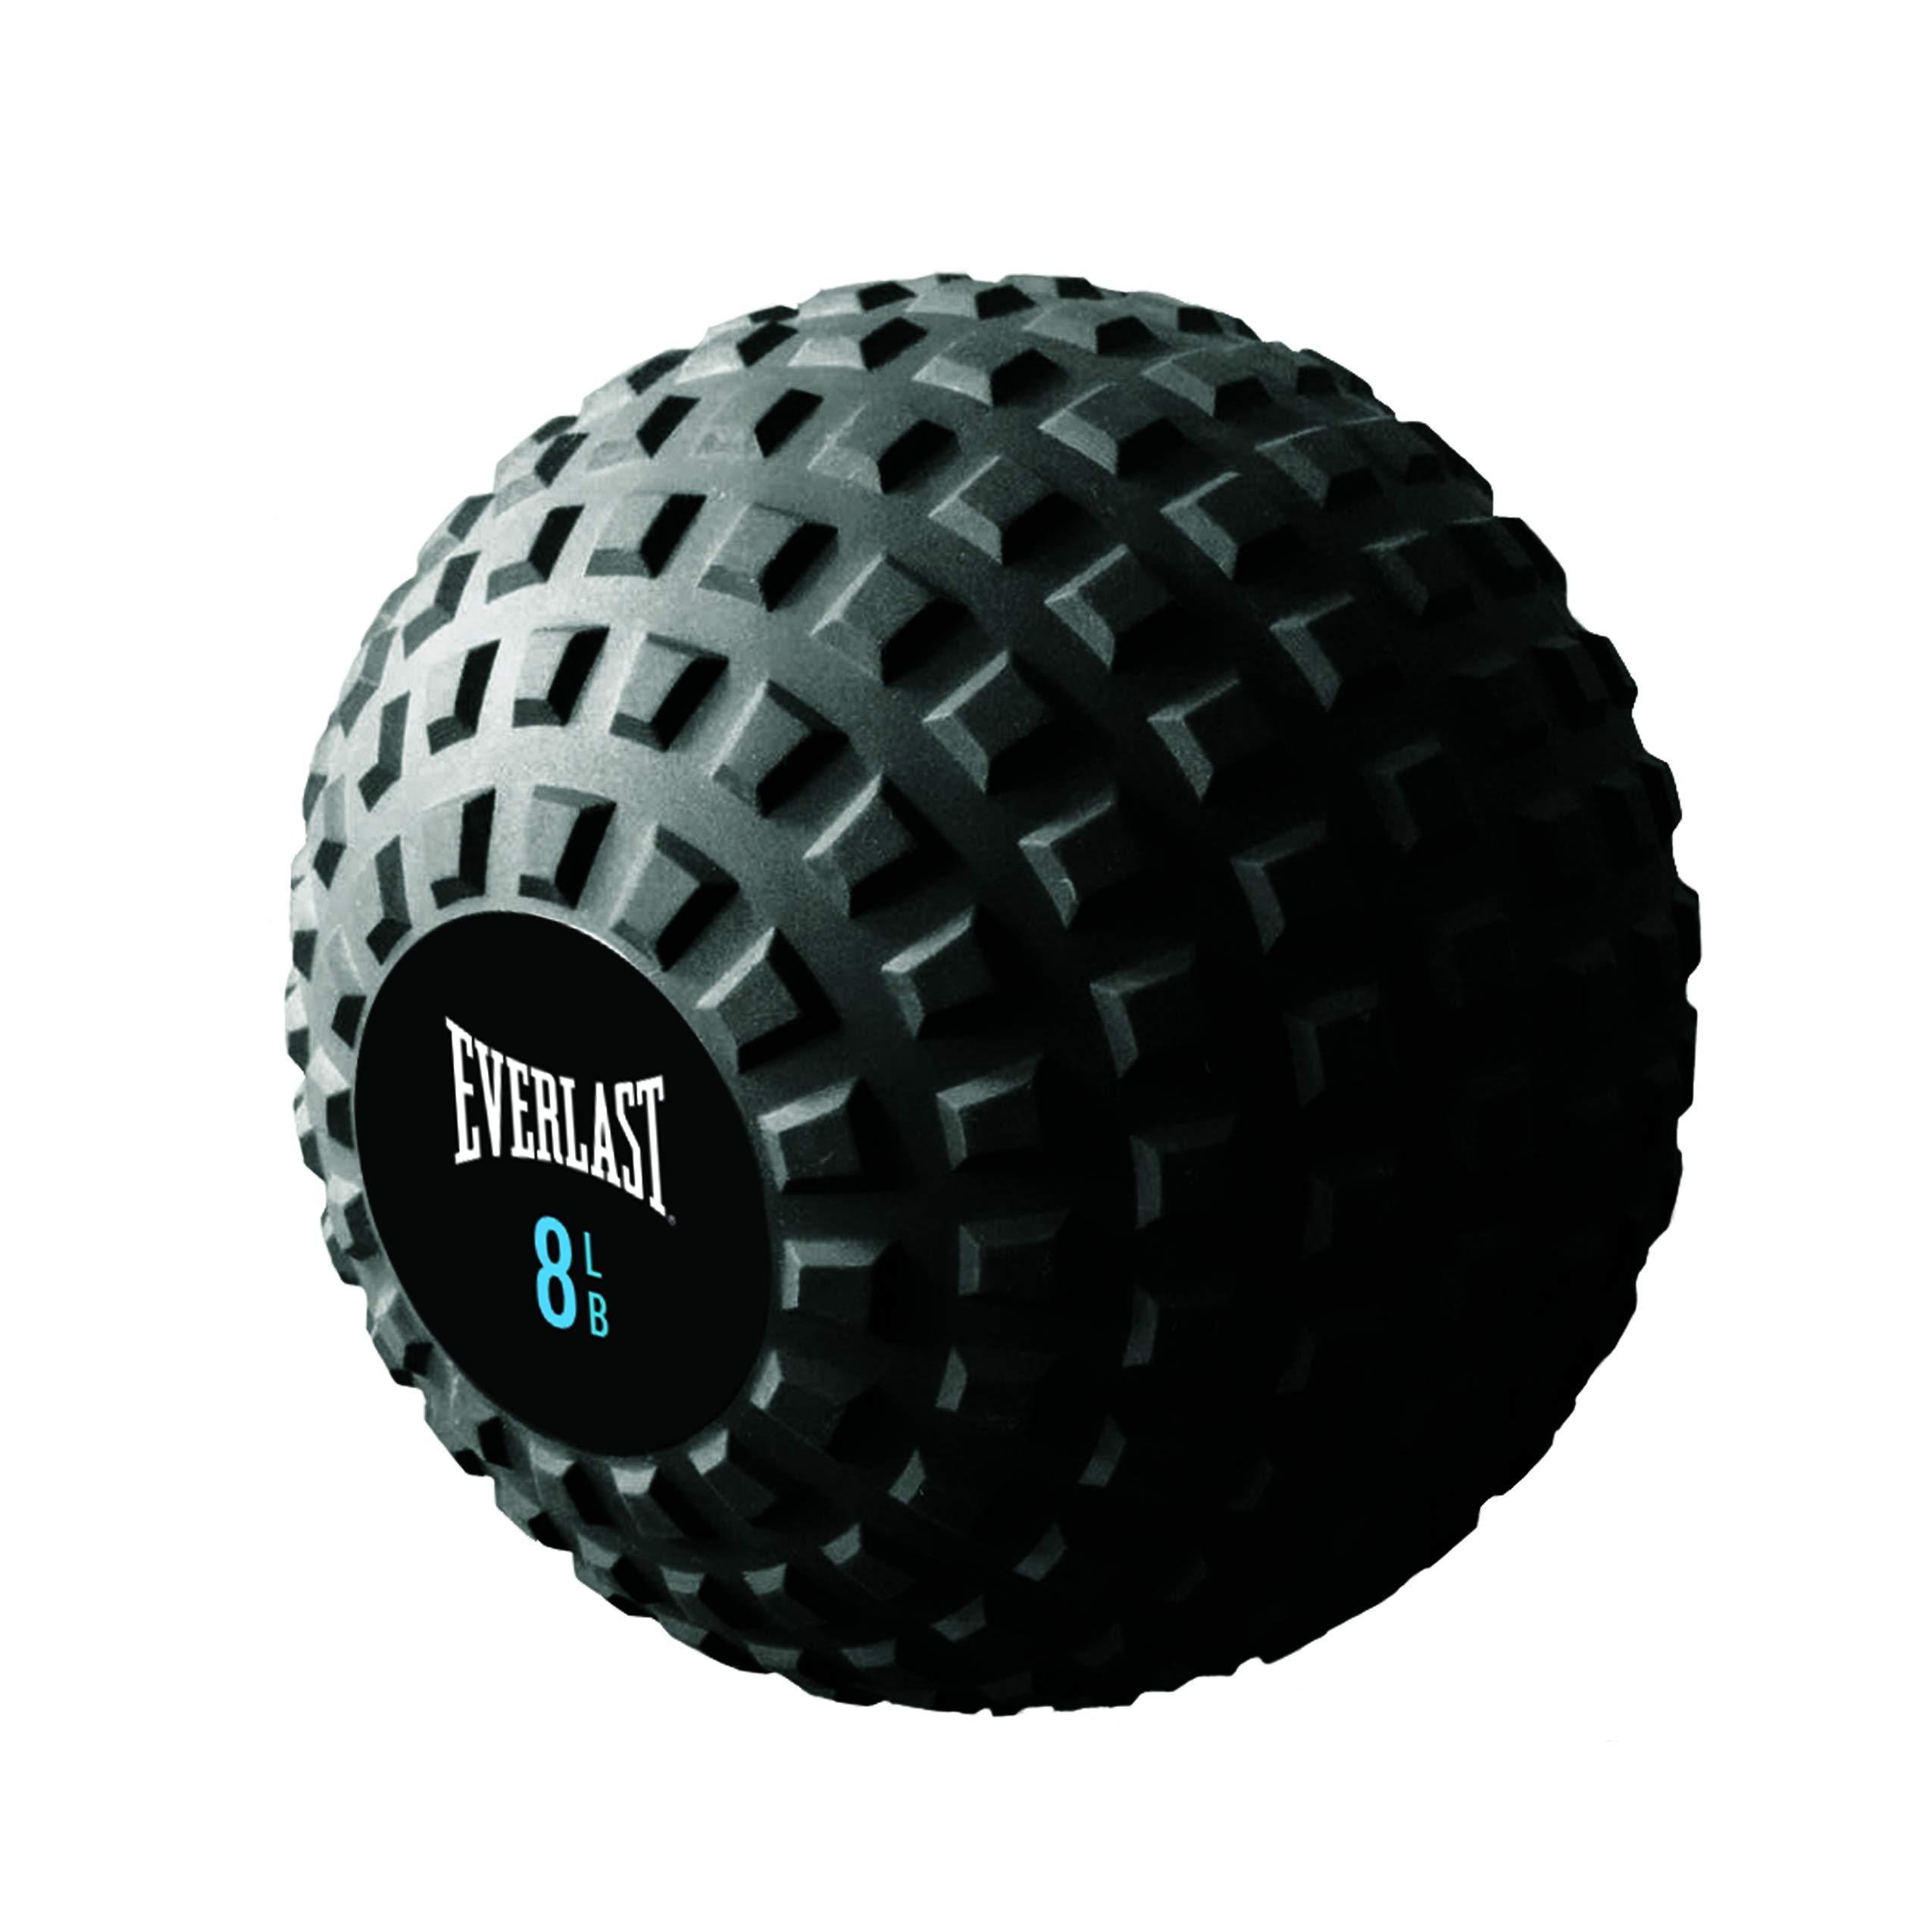 Everlast 8lb Textured Slam Ball Textured Slam Ball